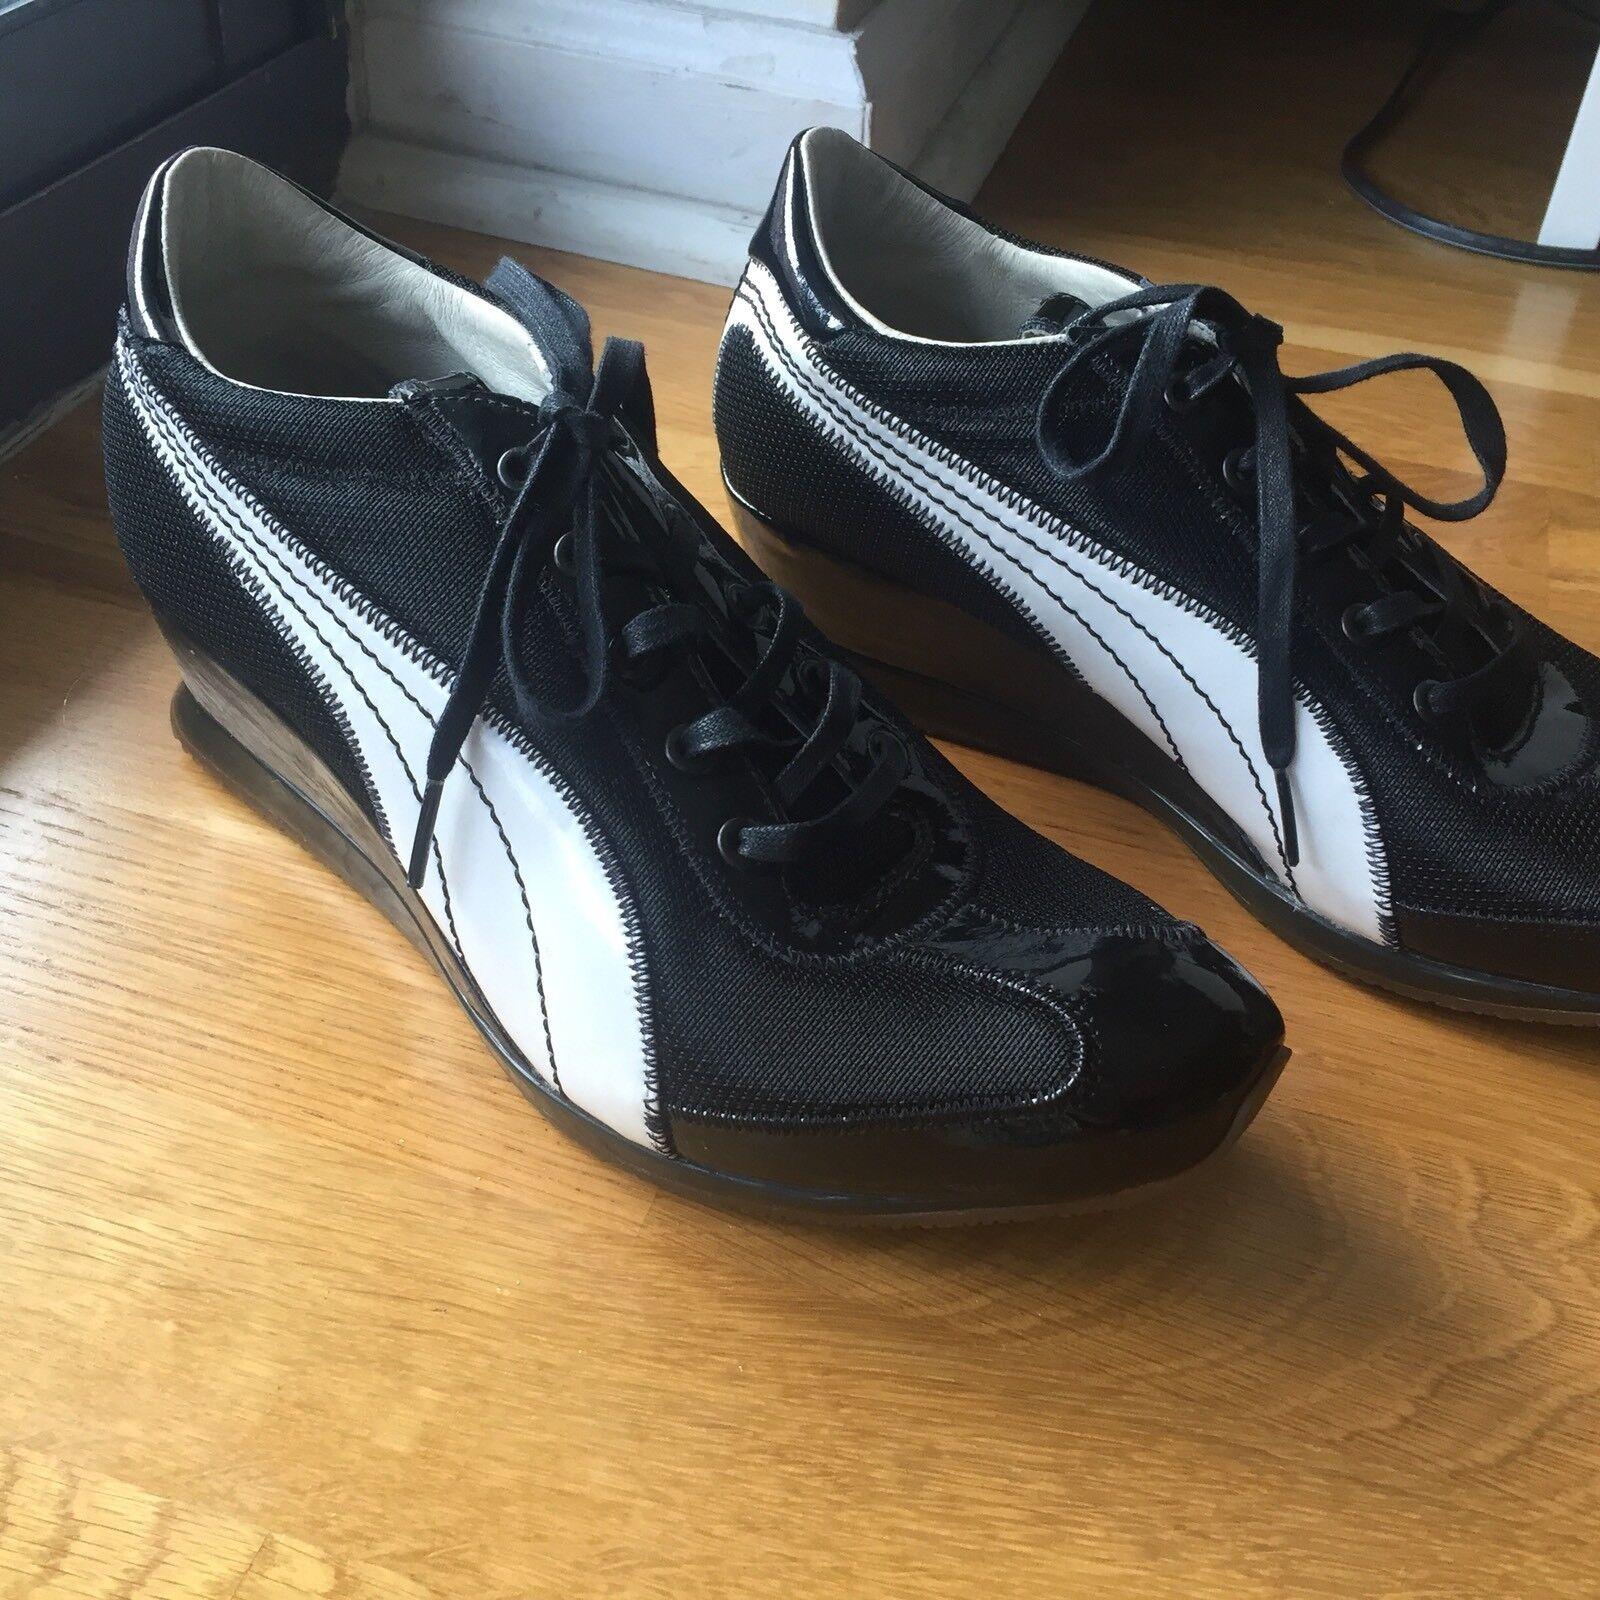 Raro puma nero label wmn scarpe us9 ferro tessuto tacchi